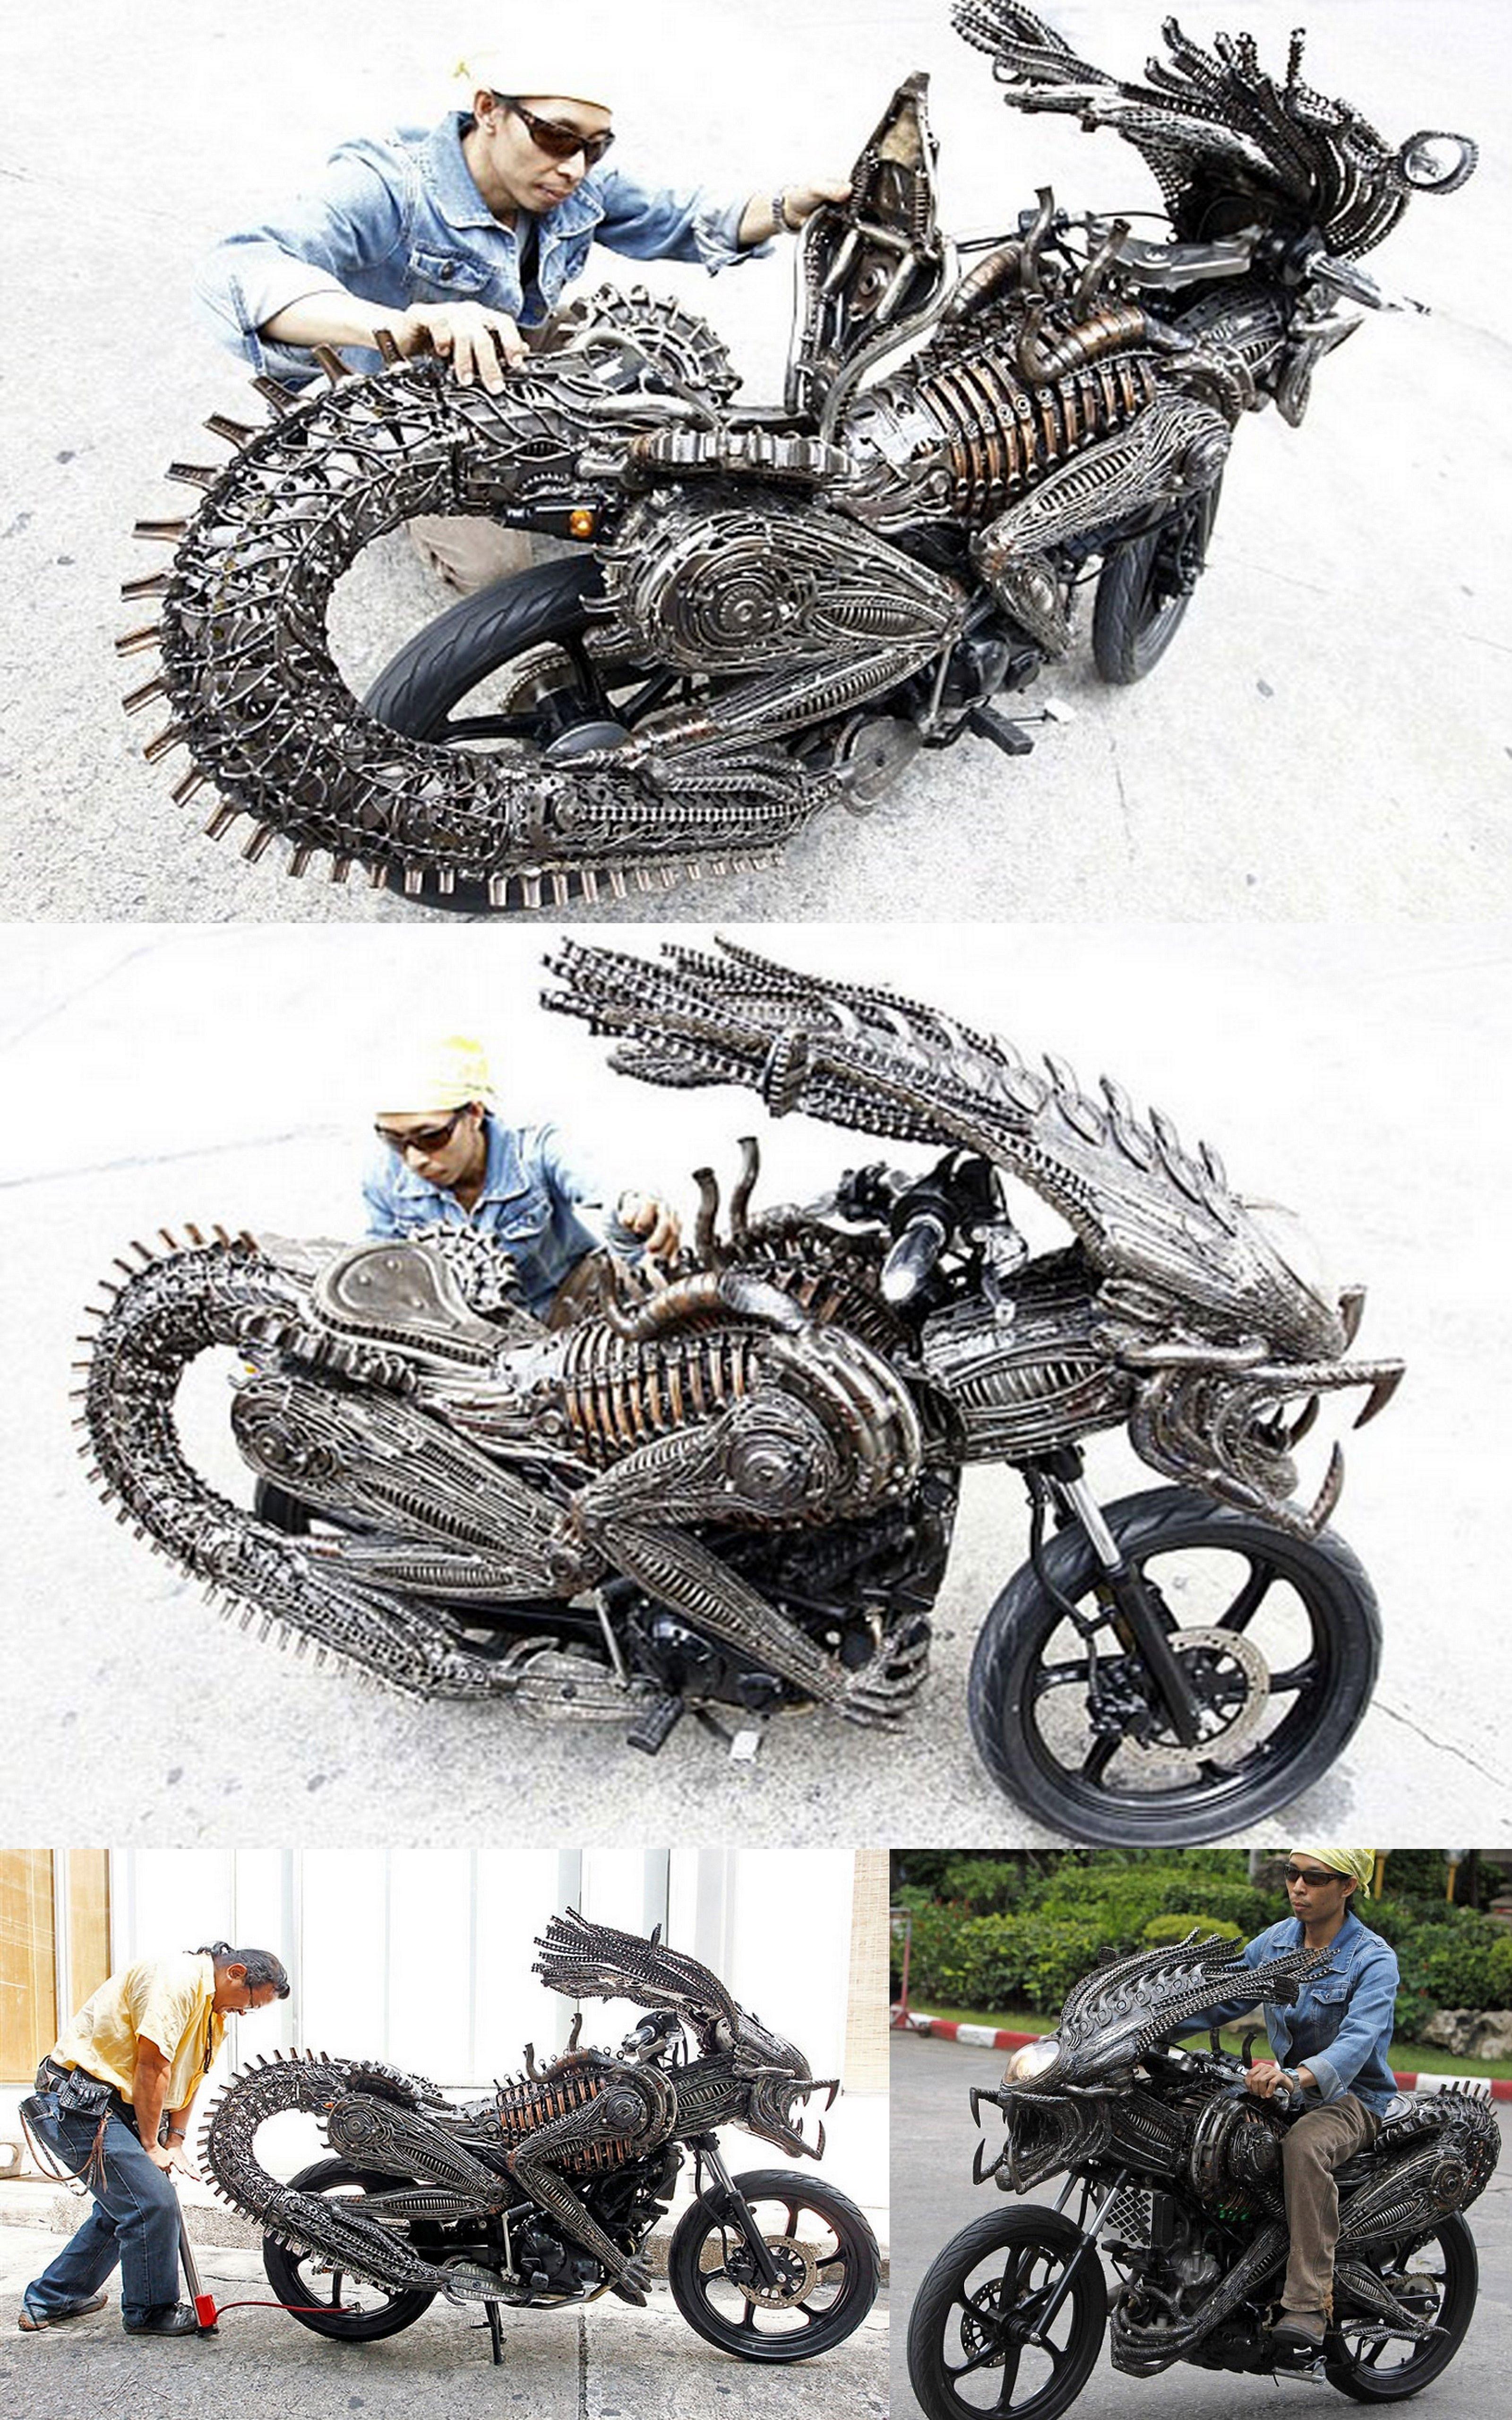 Alien Vs Predator Motorcycle Motocicletas Vintage Carros E